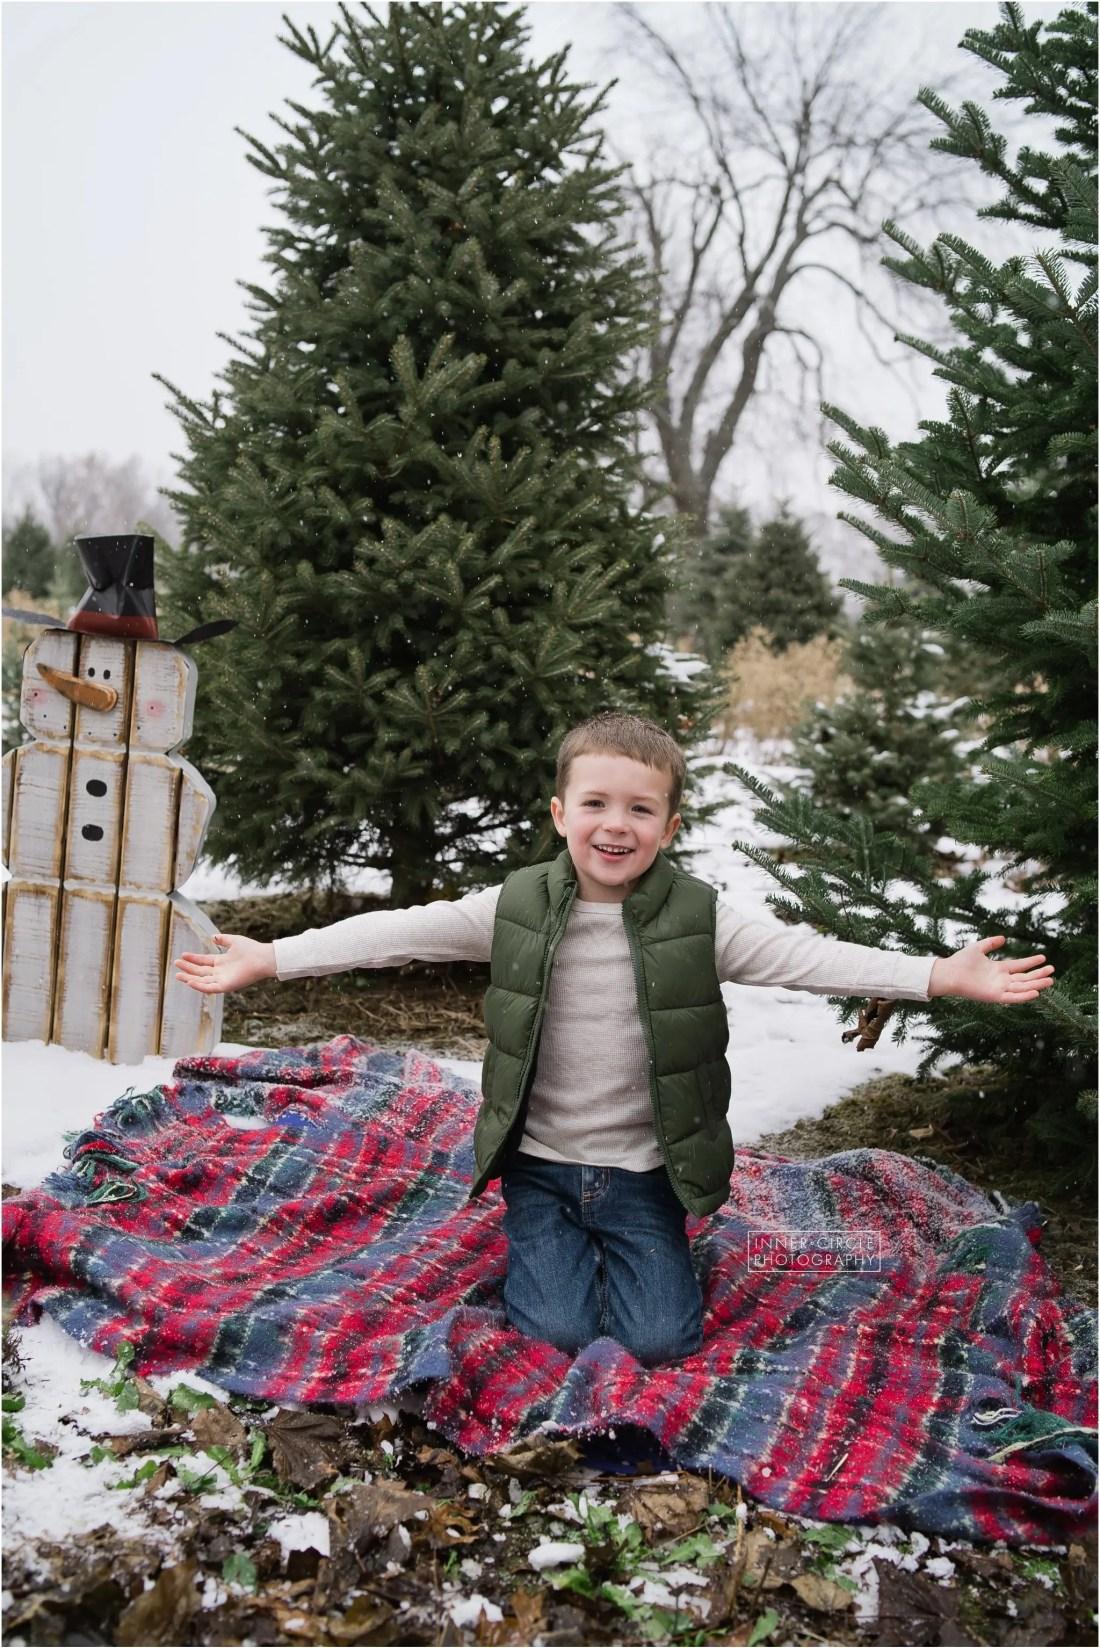 Hansen_TreeFarm_InnerCirclePhoto_015 Hansen Family - Addison Oaks Tree Farm